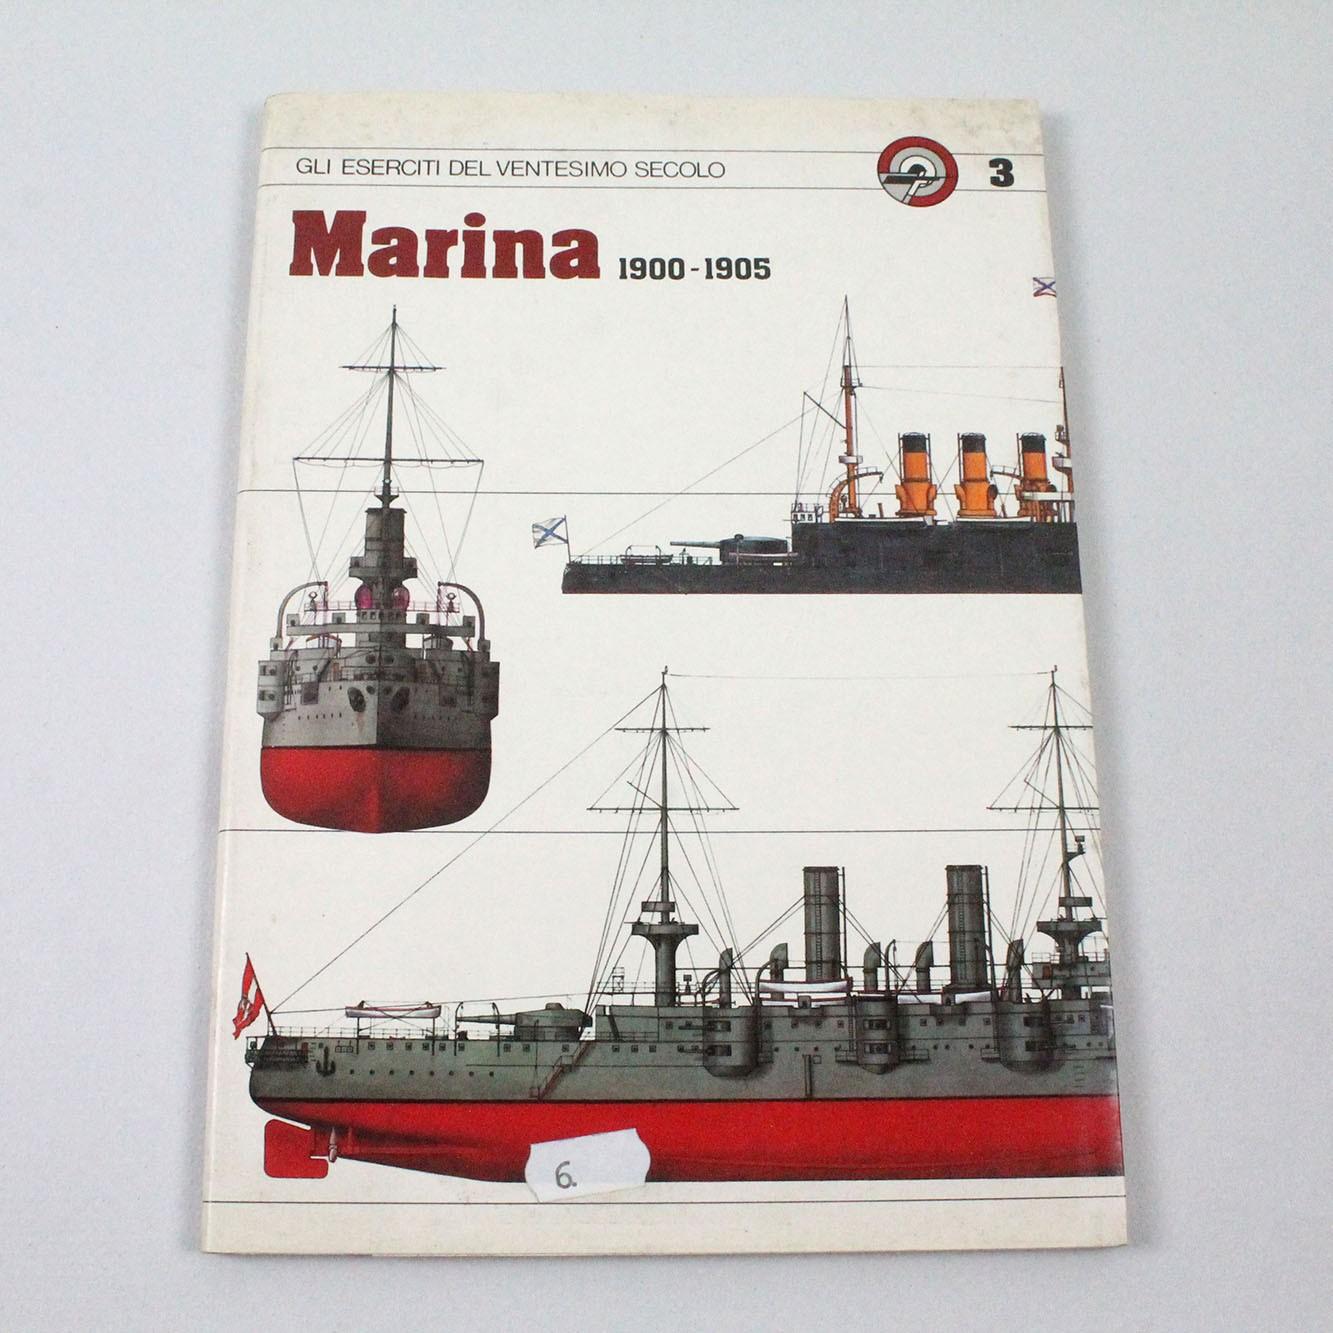 LIBIT-MARINA 1900-1905